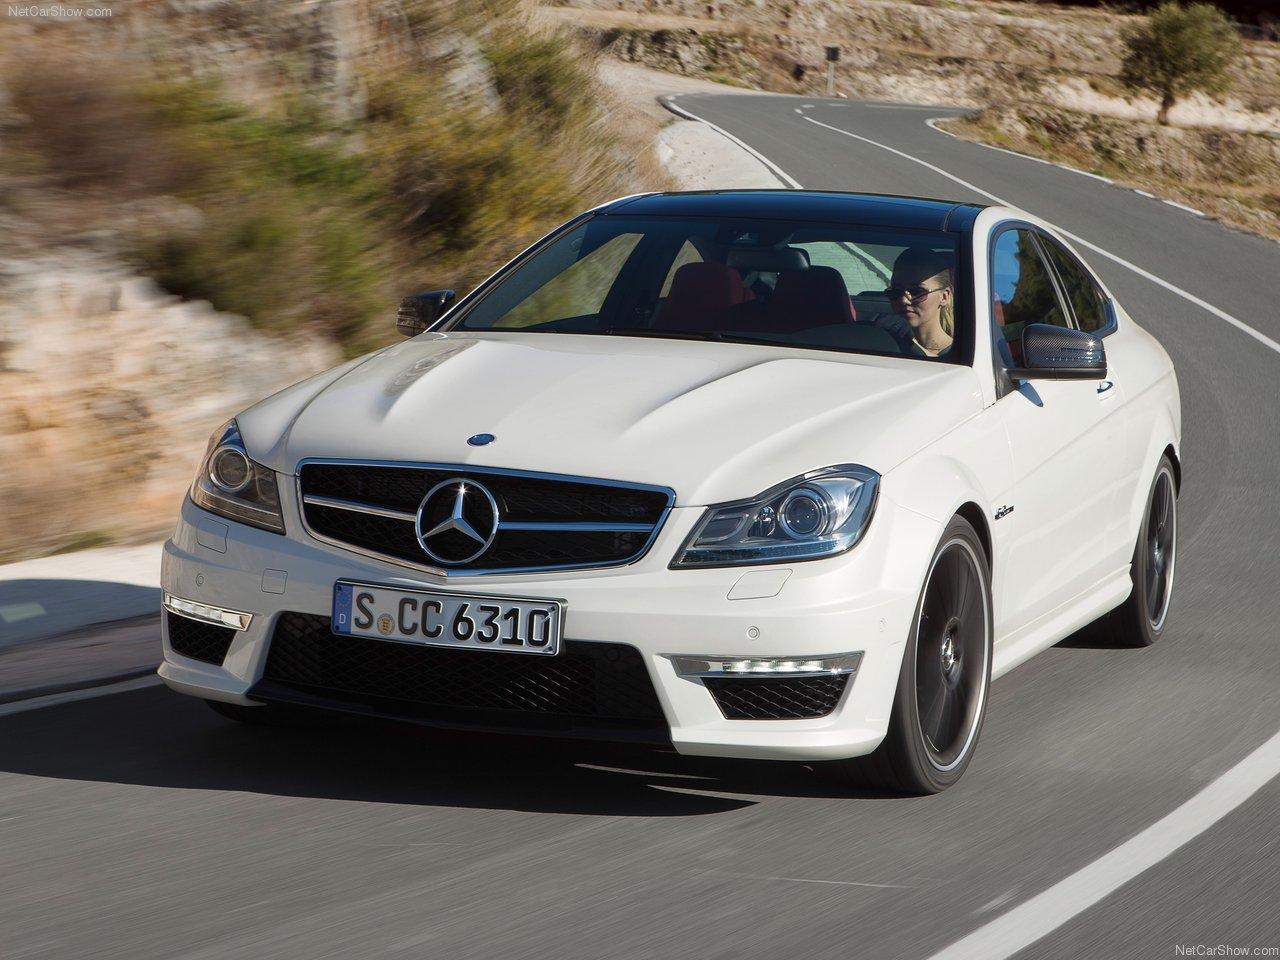 http://3.bp.blogspot.com/-OvYD24pEQws/TYYUXVj1HLI/AAAAAAACMJM/ZCpC-clvLlY/s1600/Mercedes-Benz-C63_AMG_Coupe_2012_1280x960_wallpaper_05.jpg